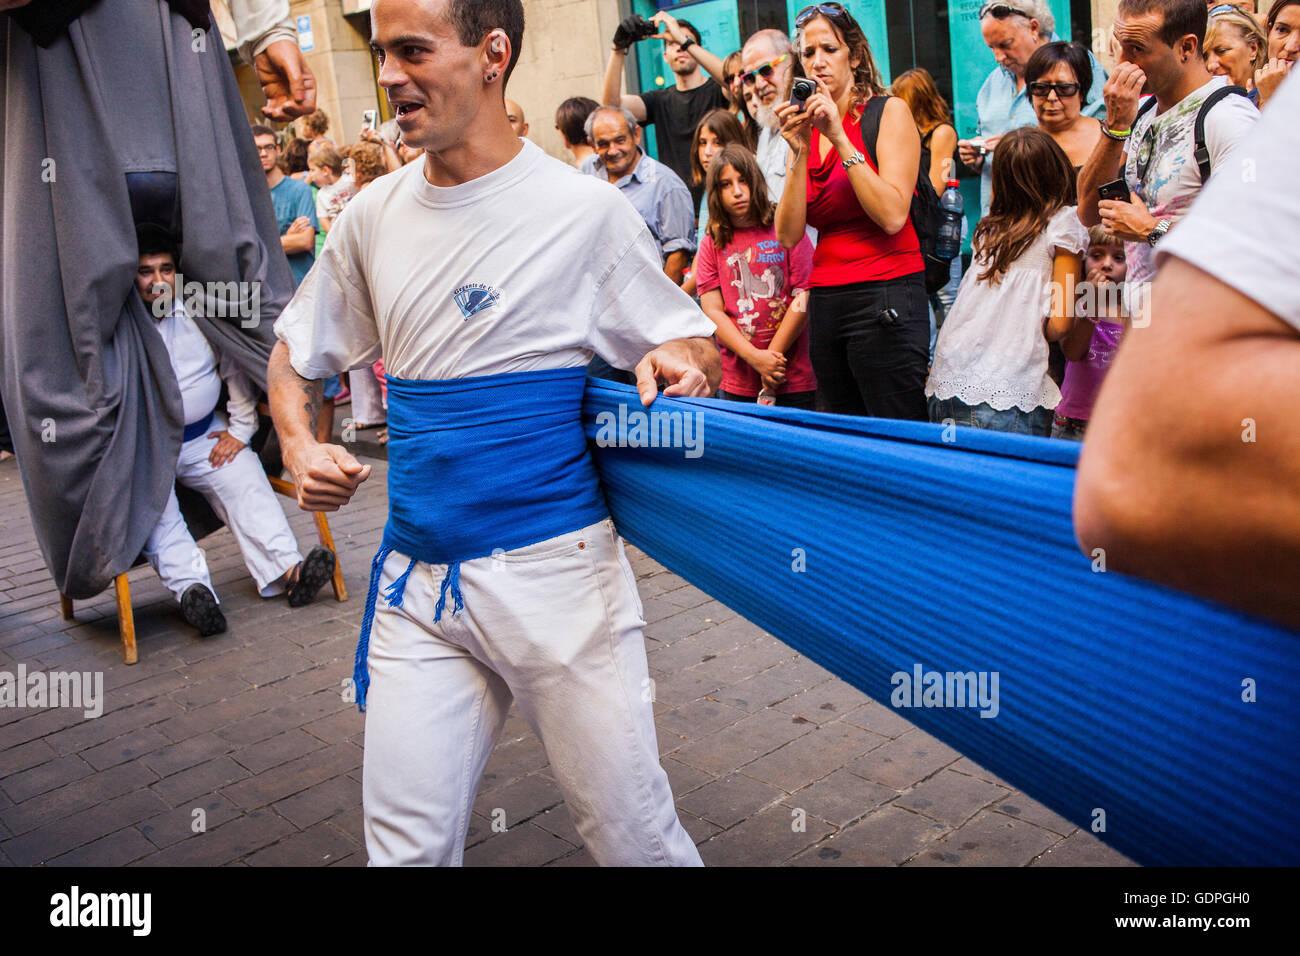 People prepare to carry the giants during La Merce Festival, in Ferran street.  Barcelona. Catalonia. Spain Stock Photo